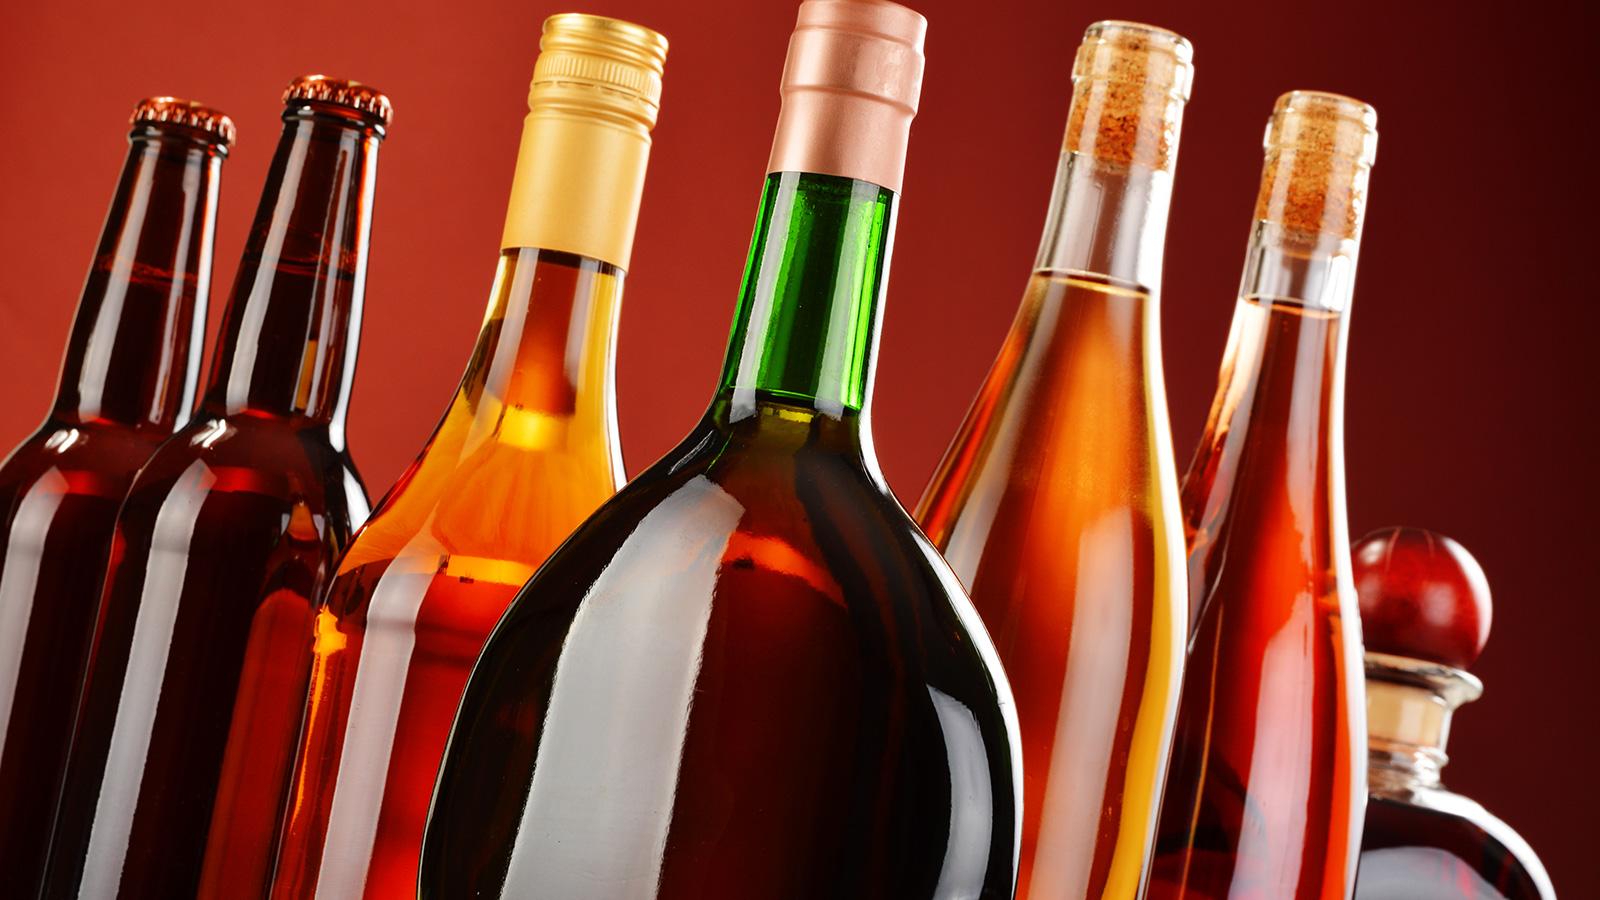 Beer and wine bottles